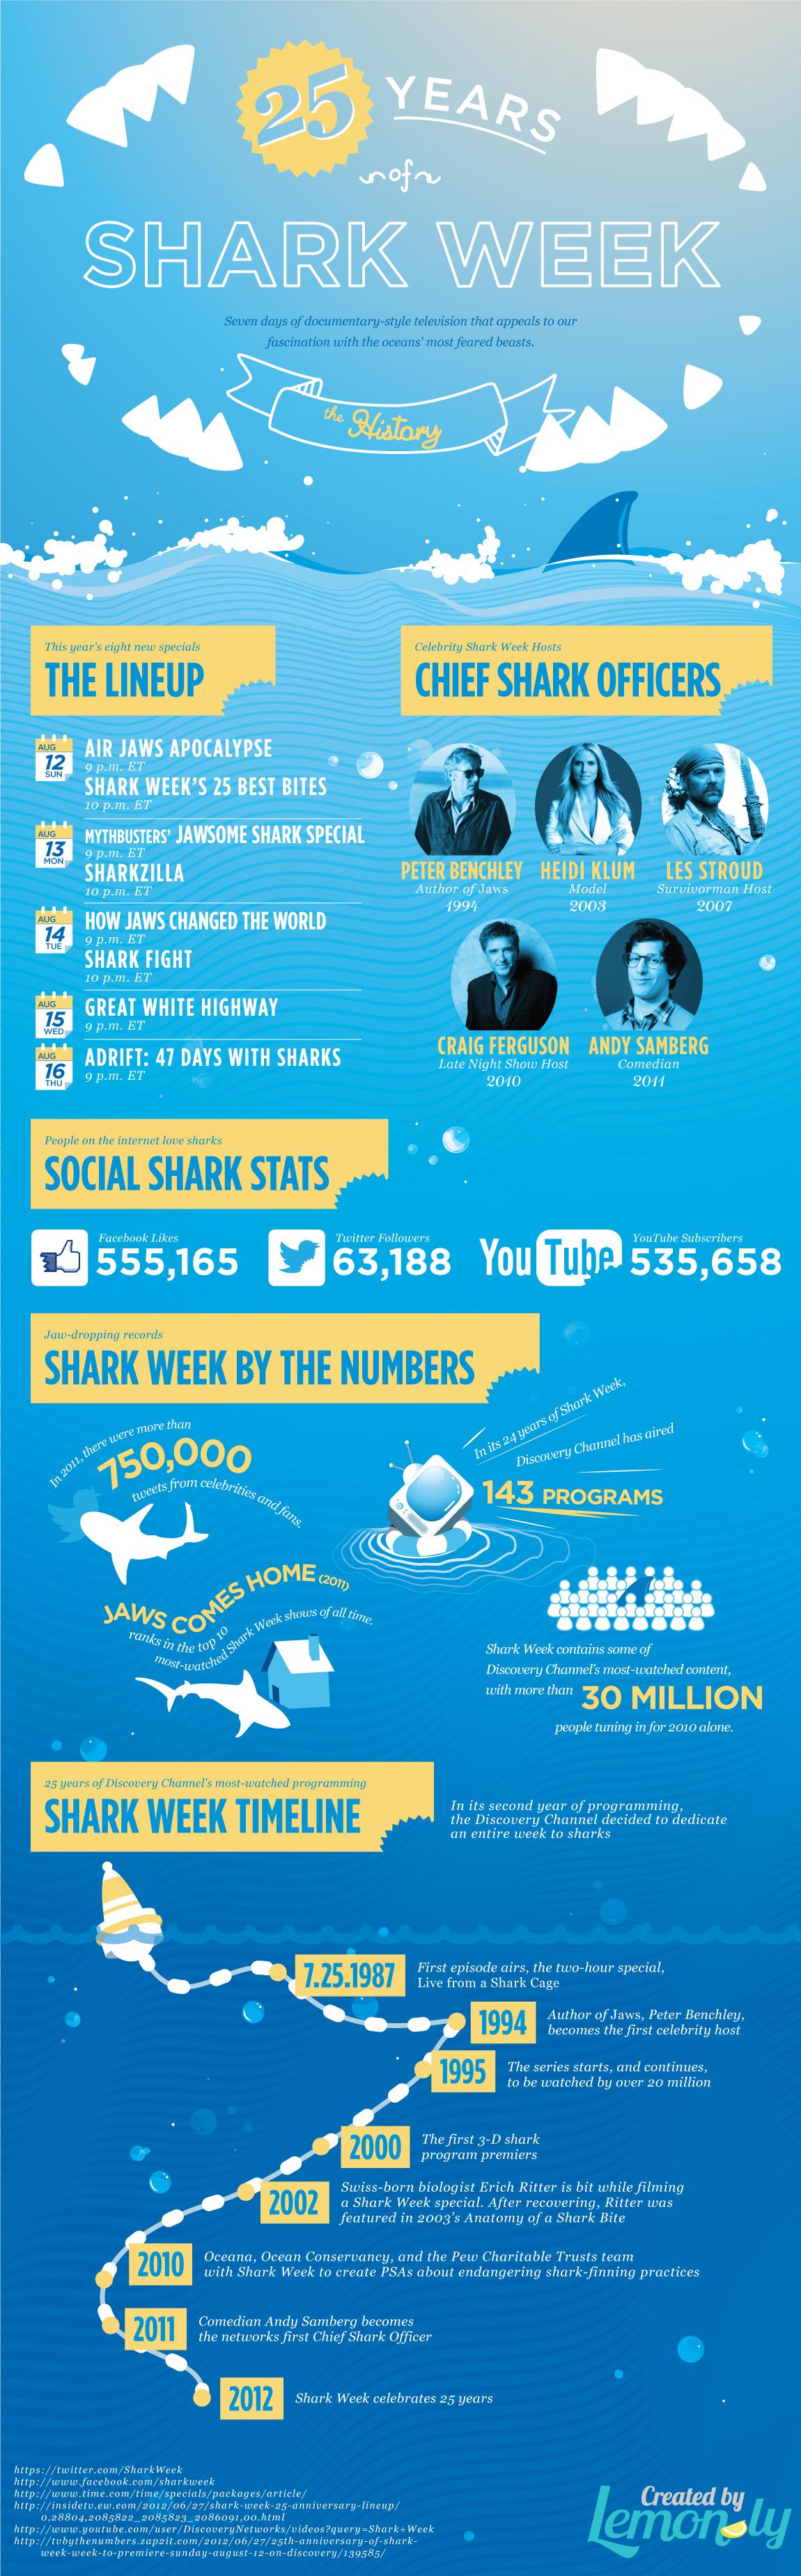 25 Years Of Shark Week